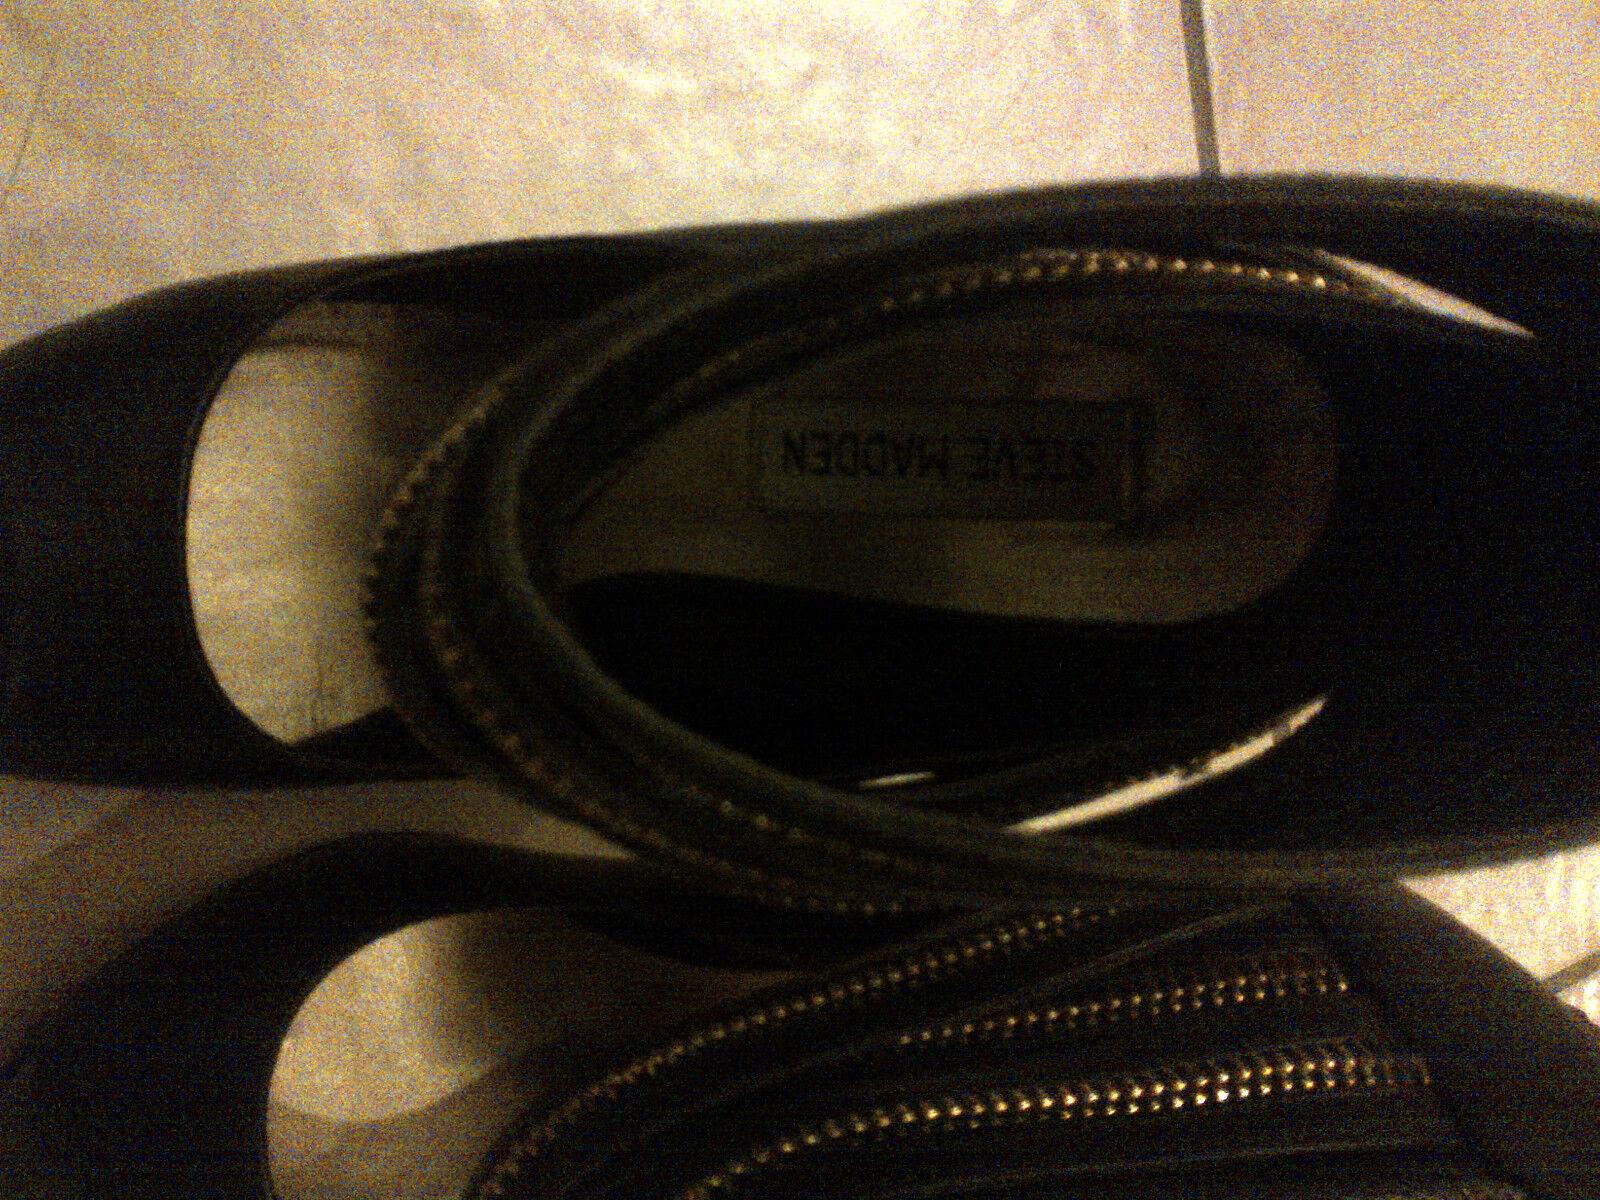 Steve Madden Black Leather shoes Heels Boots Zipper Unique Size Size Size 7 WORE IT ONCE da8c7b